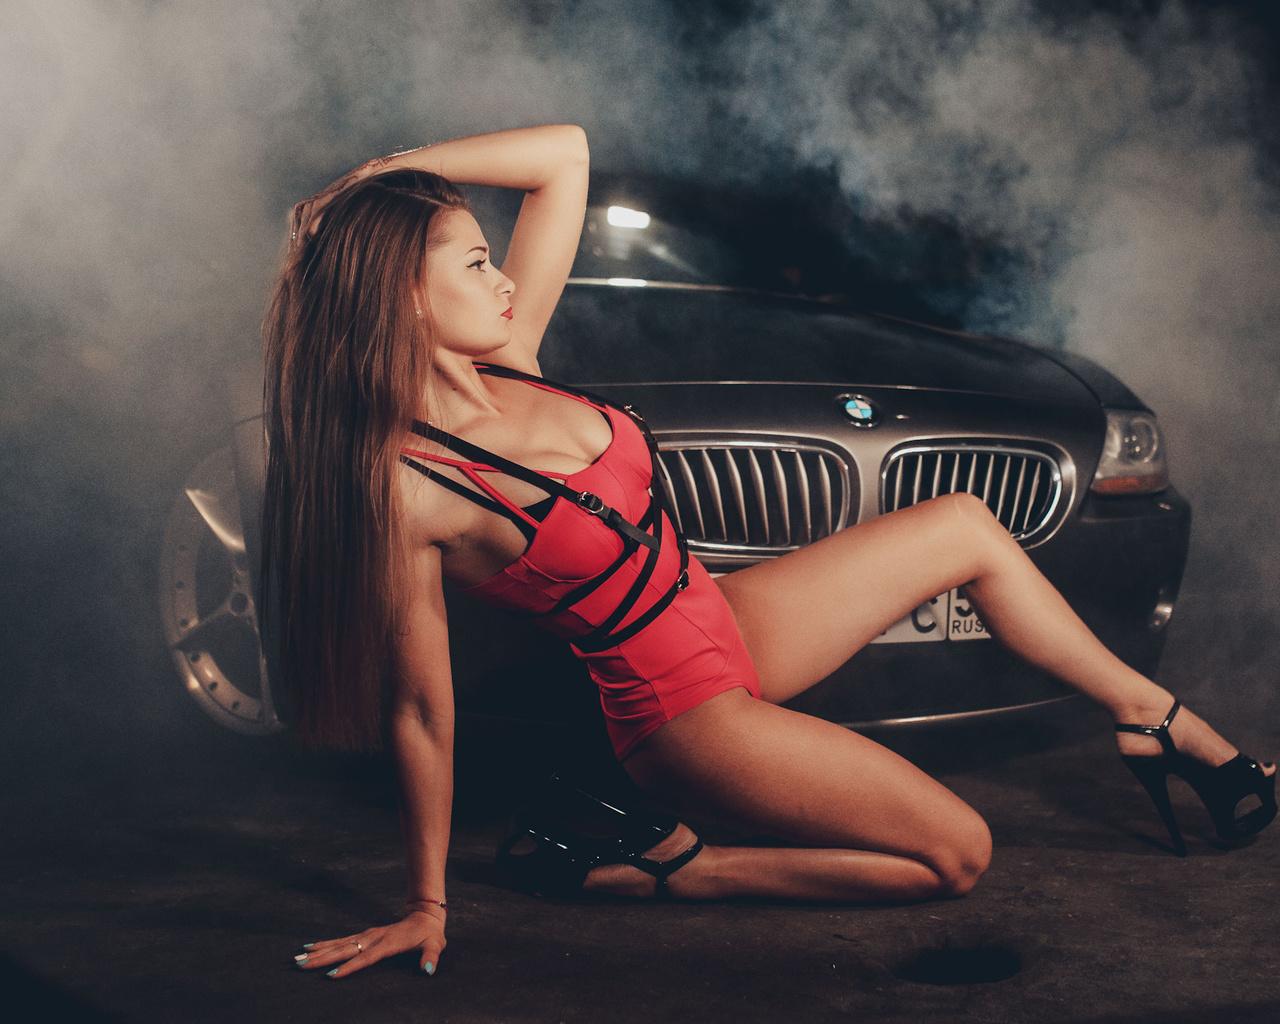 bmw, z4, roadsters, девушка, дым